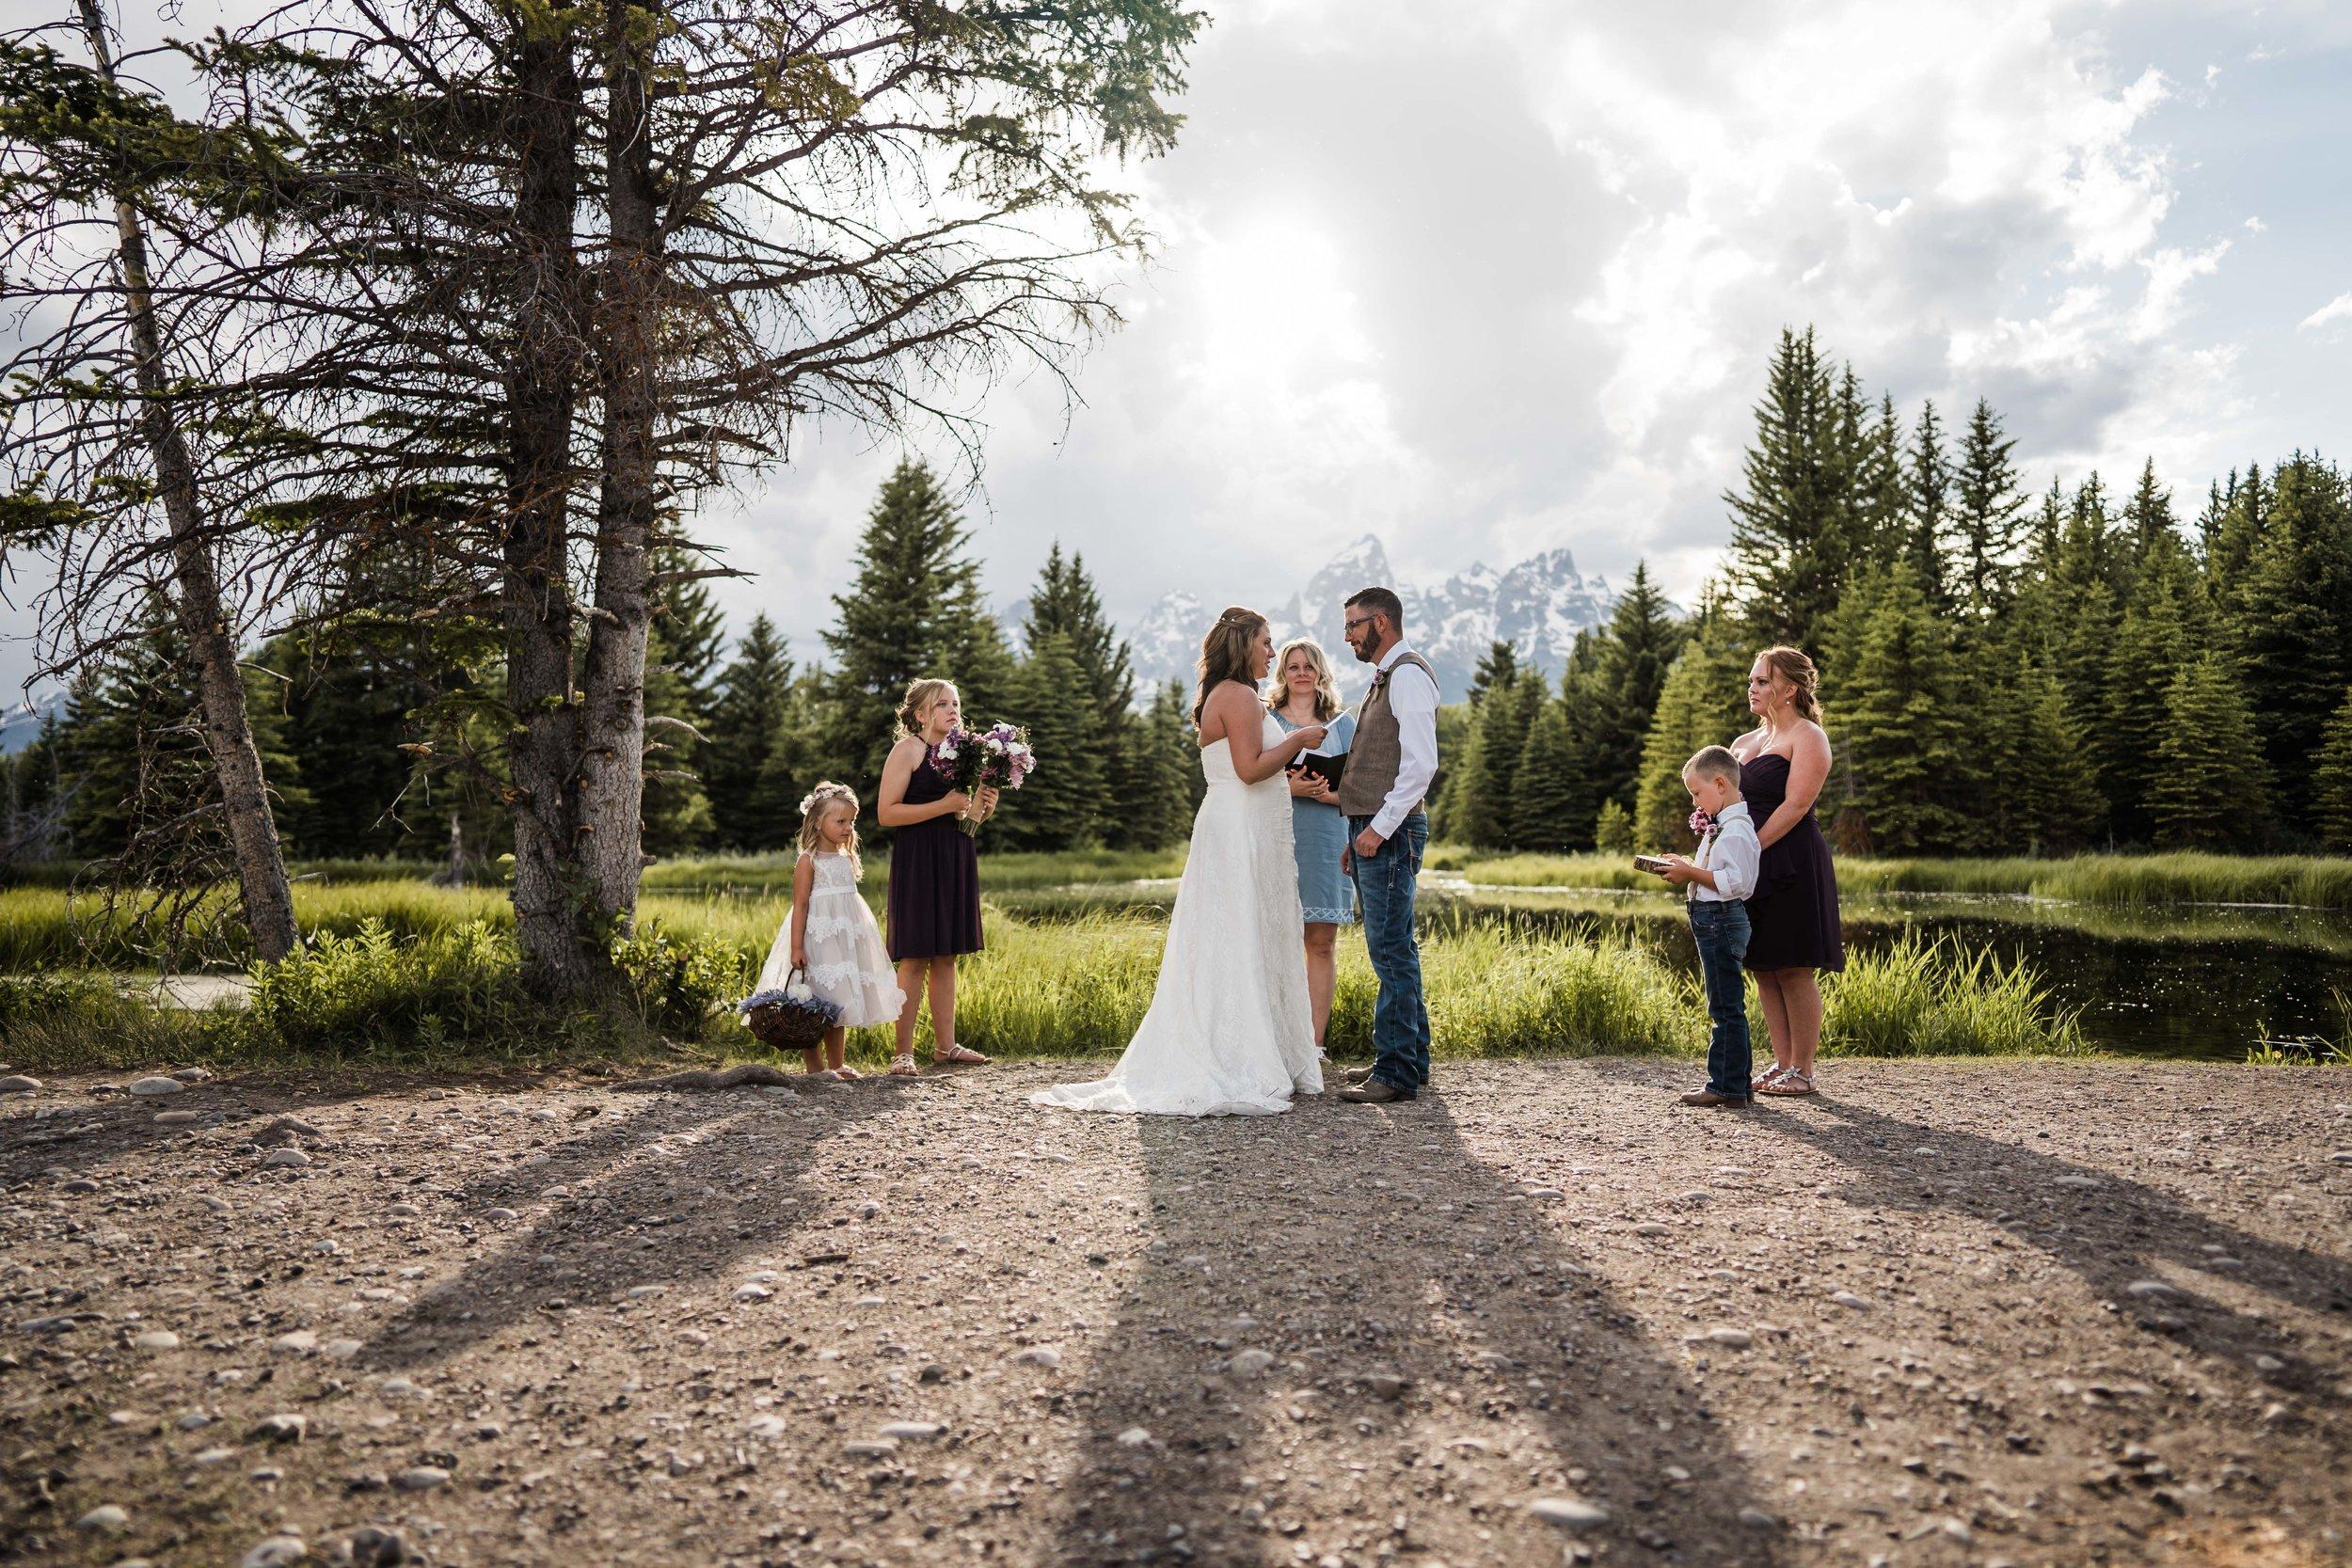 jackson hole adventure wedding photography at schwabachers landing in GTNP -DSD01624.jpg